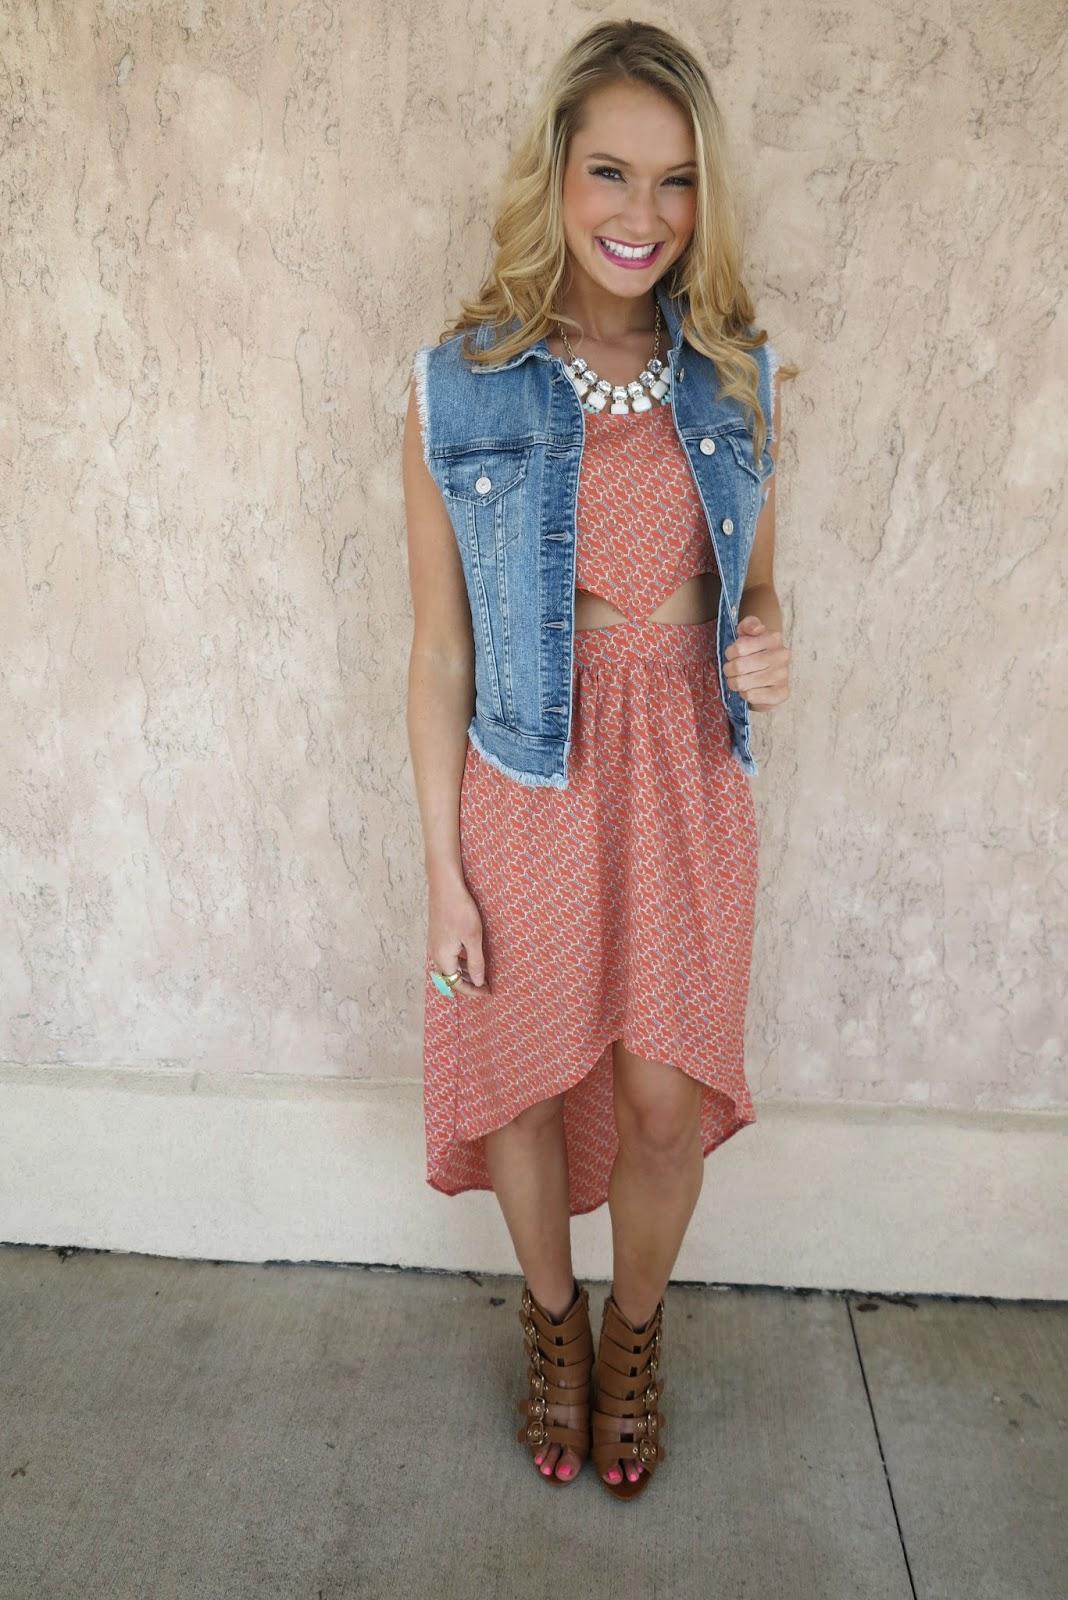 Summer dress boutiques online universities